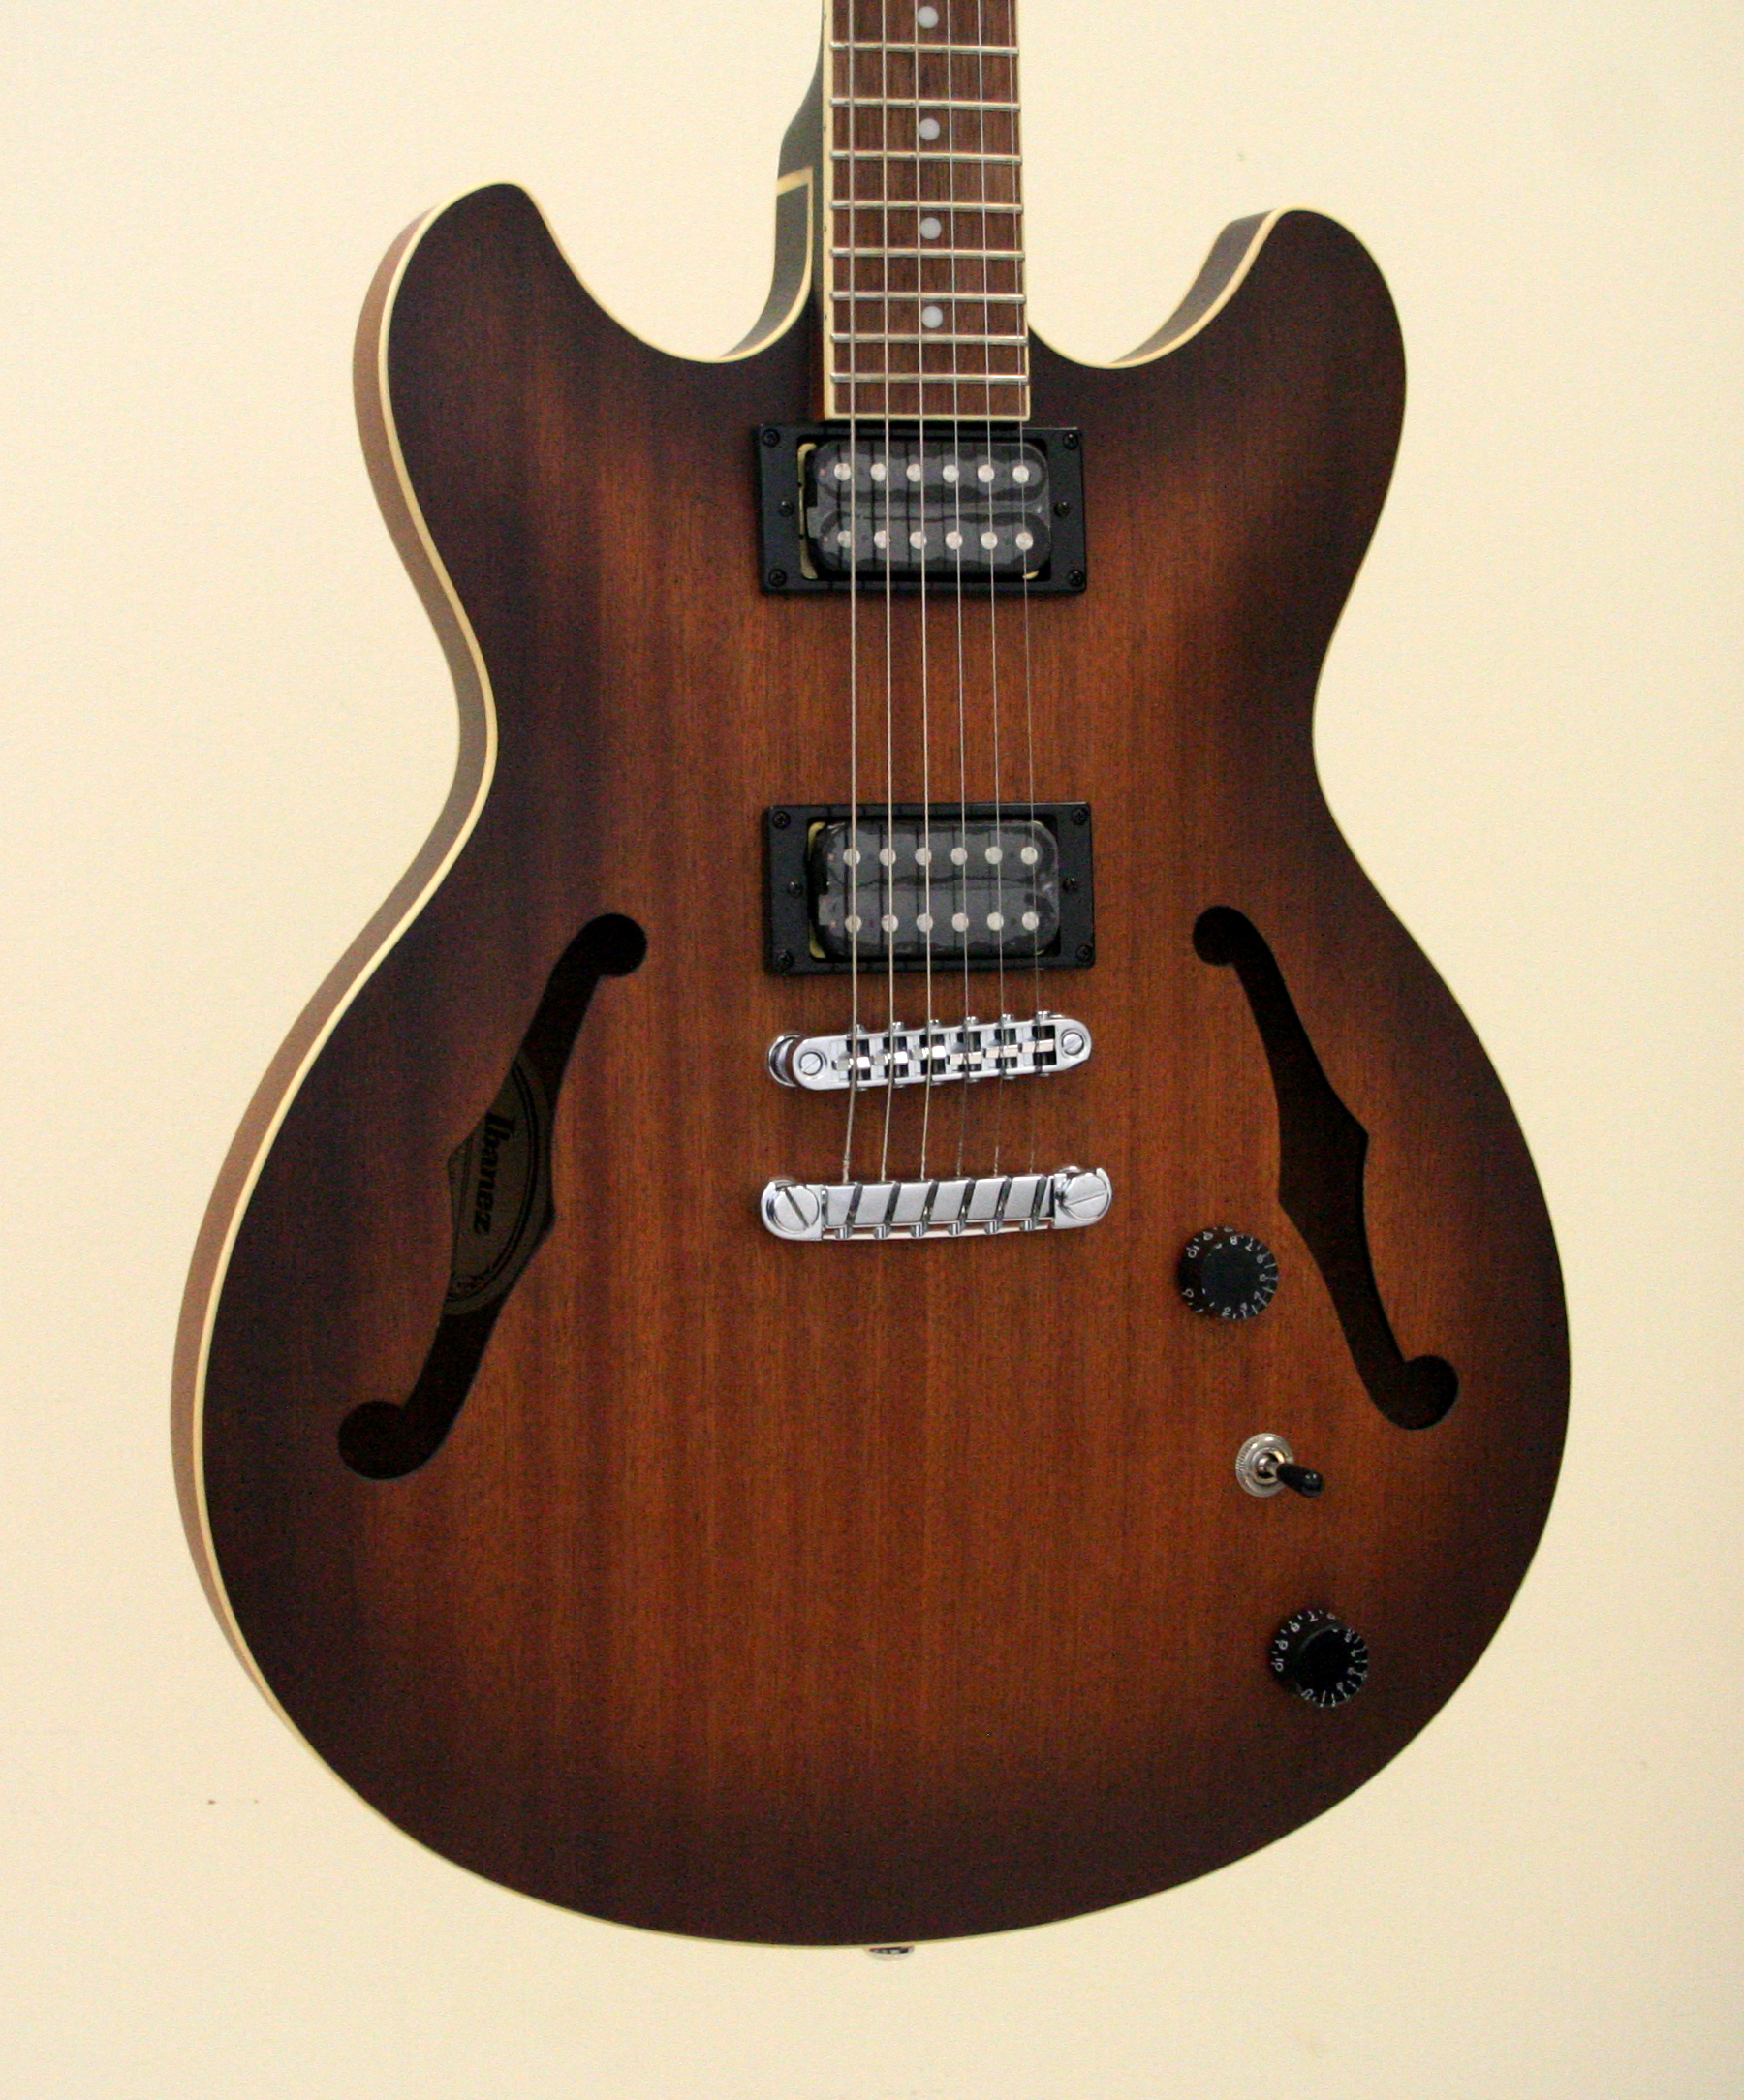 Ibanez AS53TF Semi-Hollow Body Electric Guitar Tobacco Flat